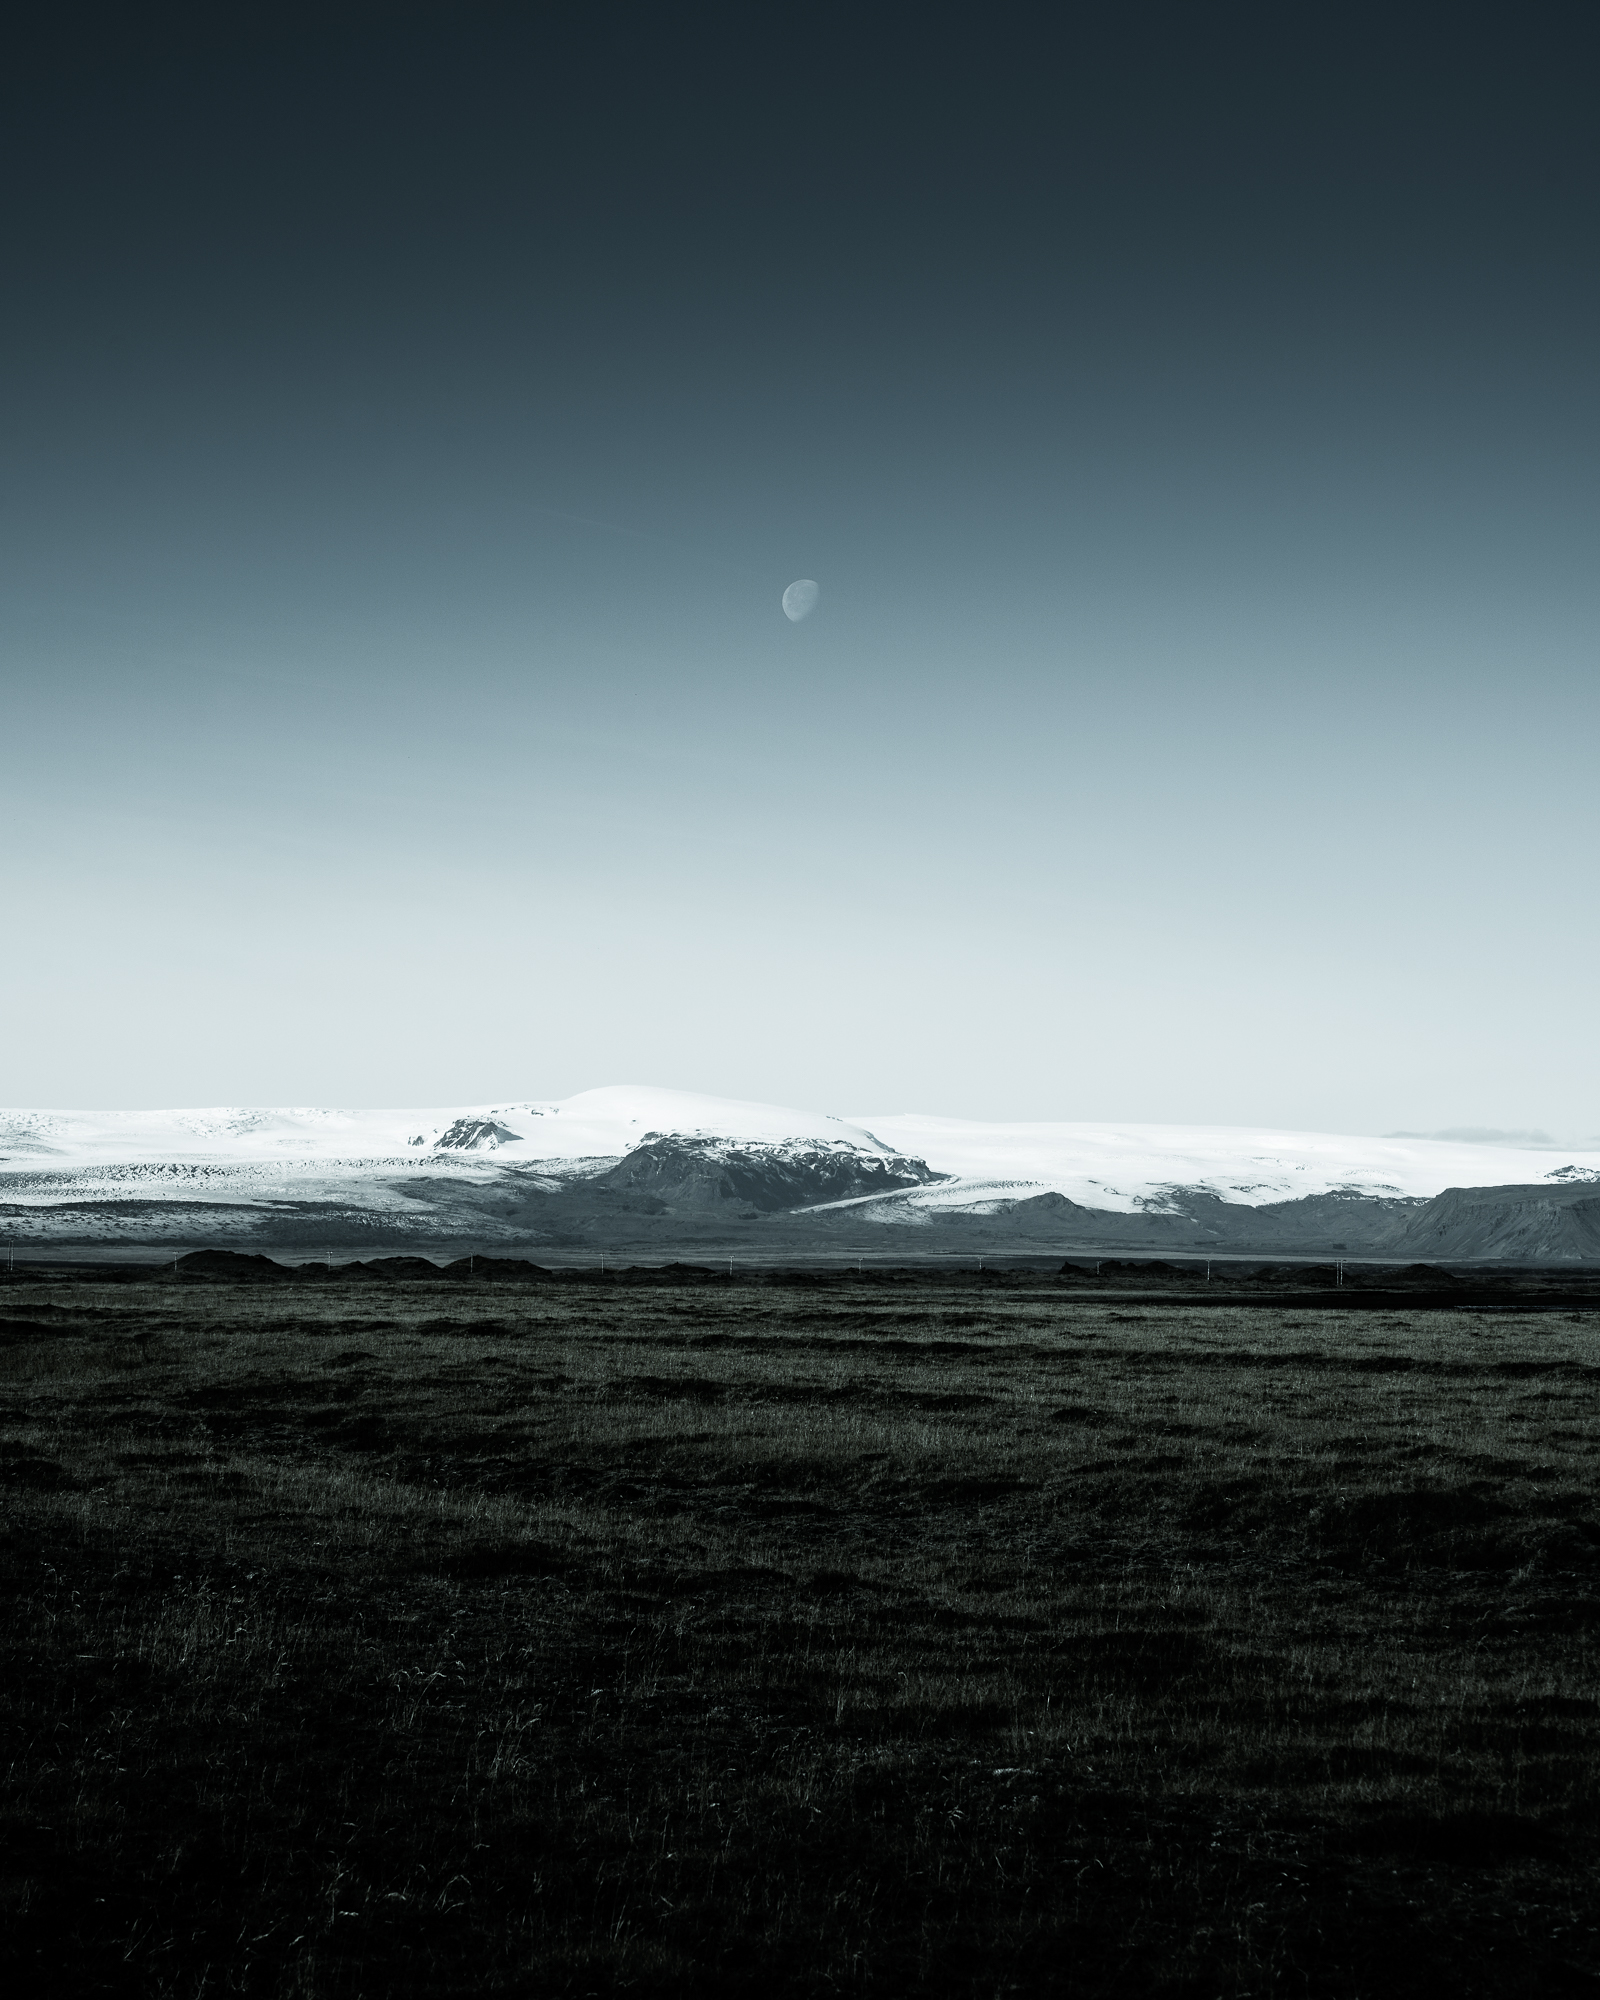 Moon2_2018_0927_Island_Instagram__DSC3750-Bearbeitet.jpg